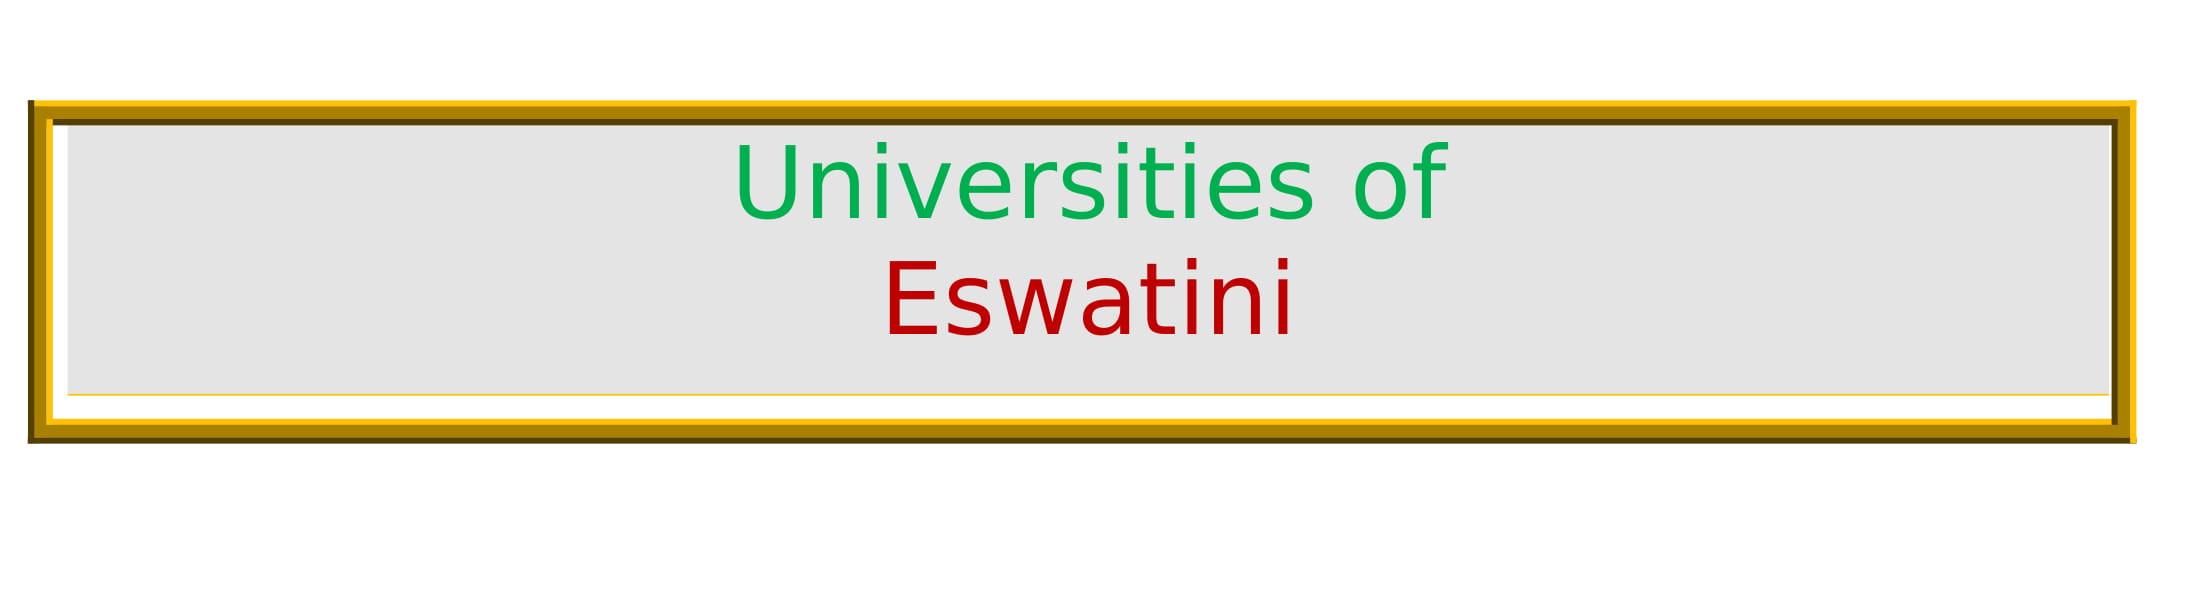 List of Universities in Eswatini